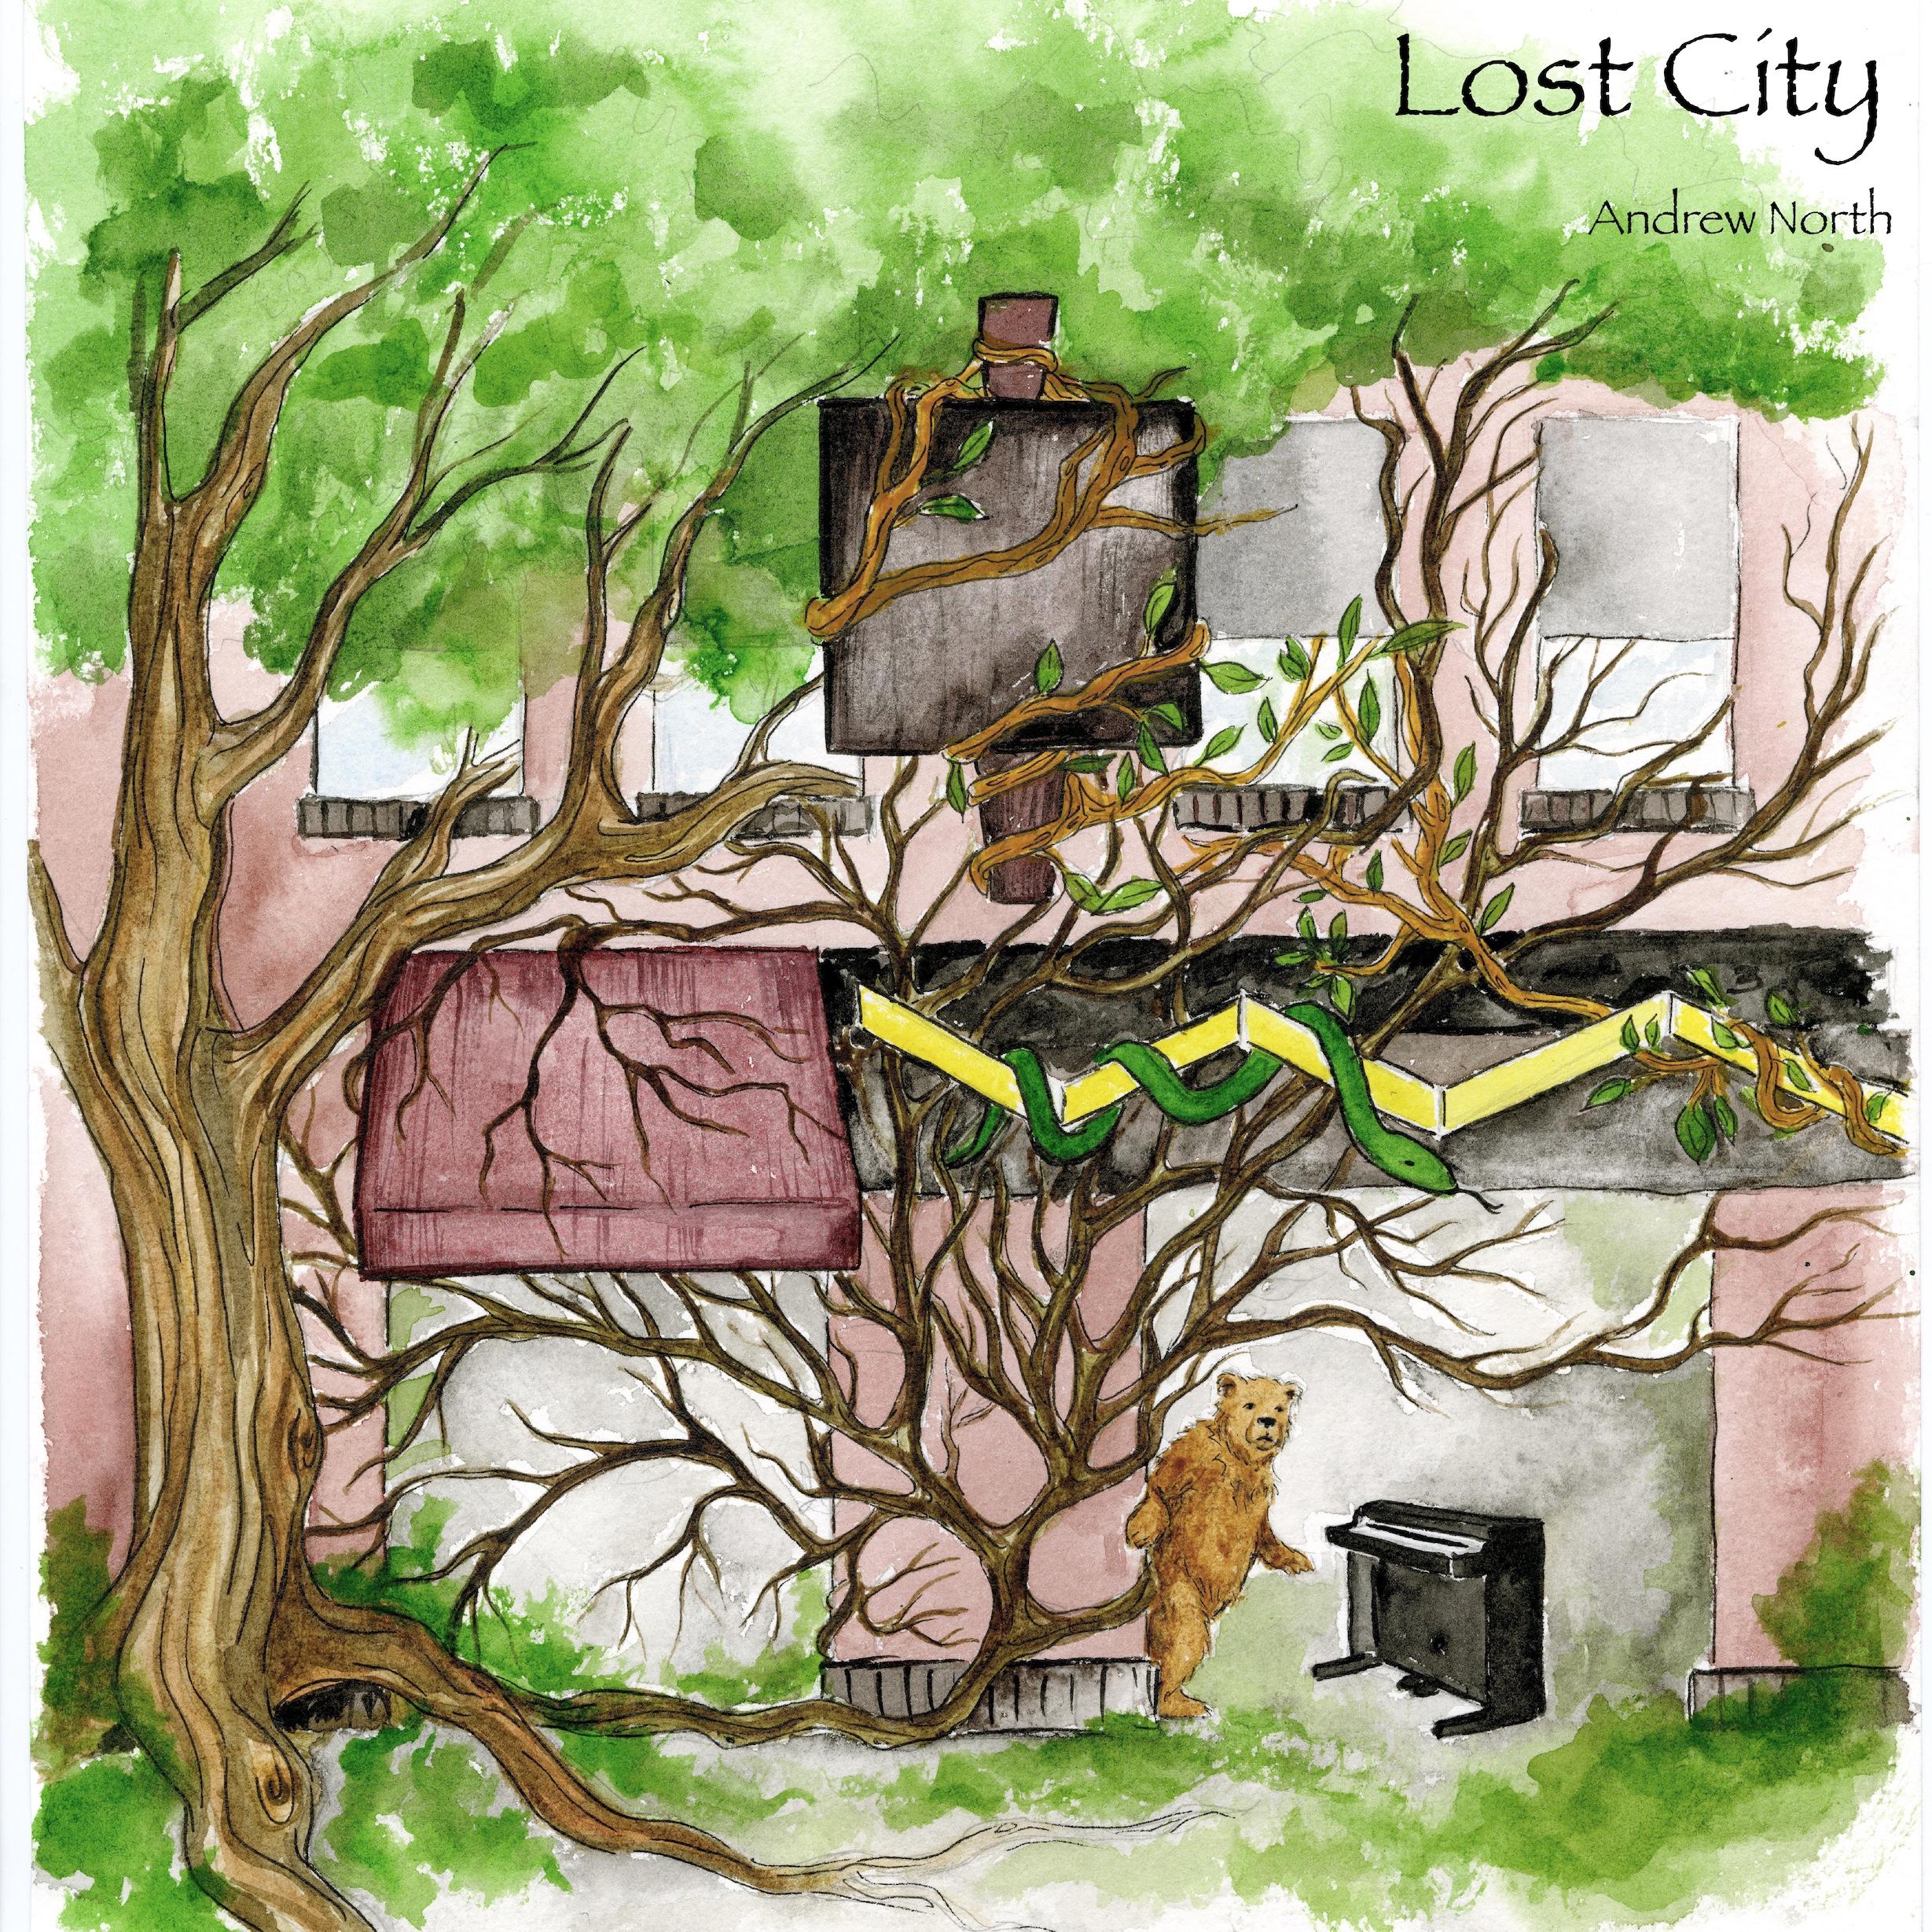 Lost City - 2019